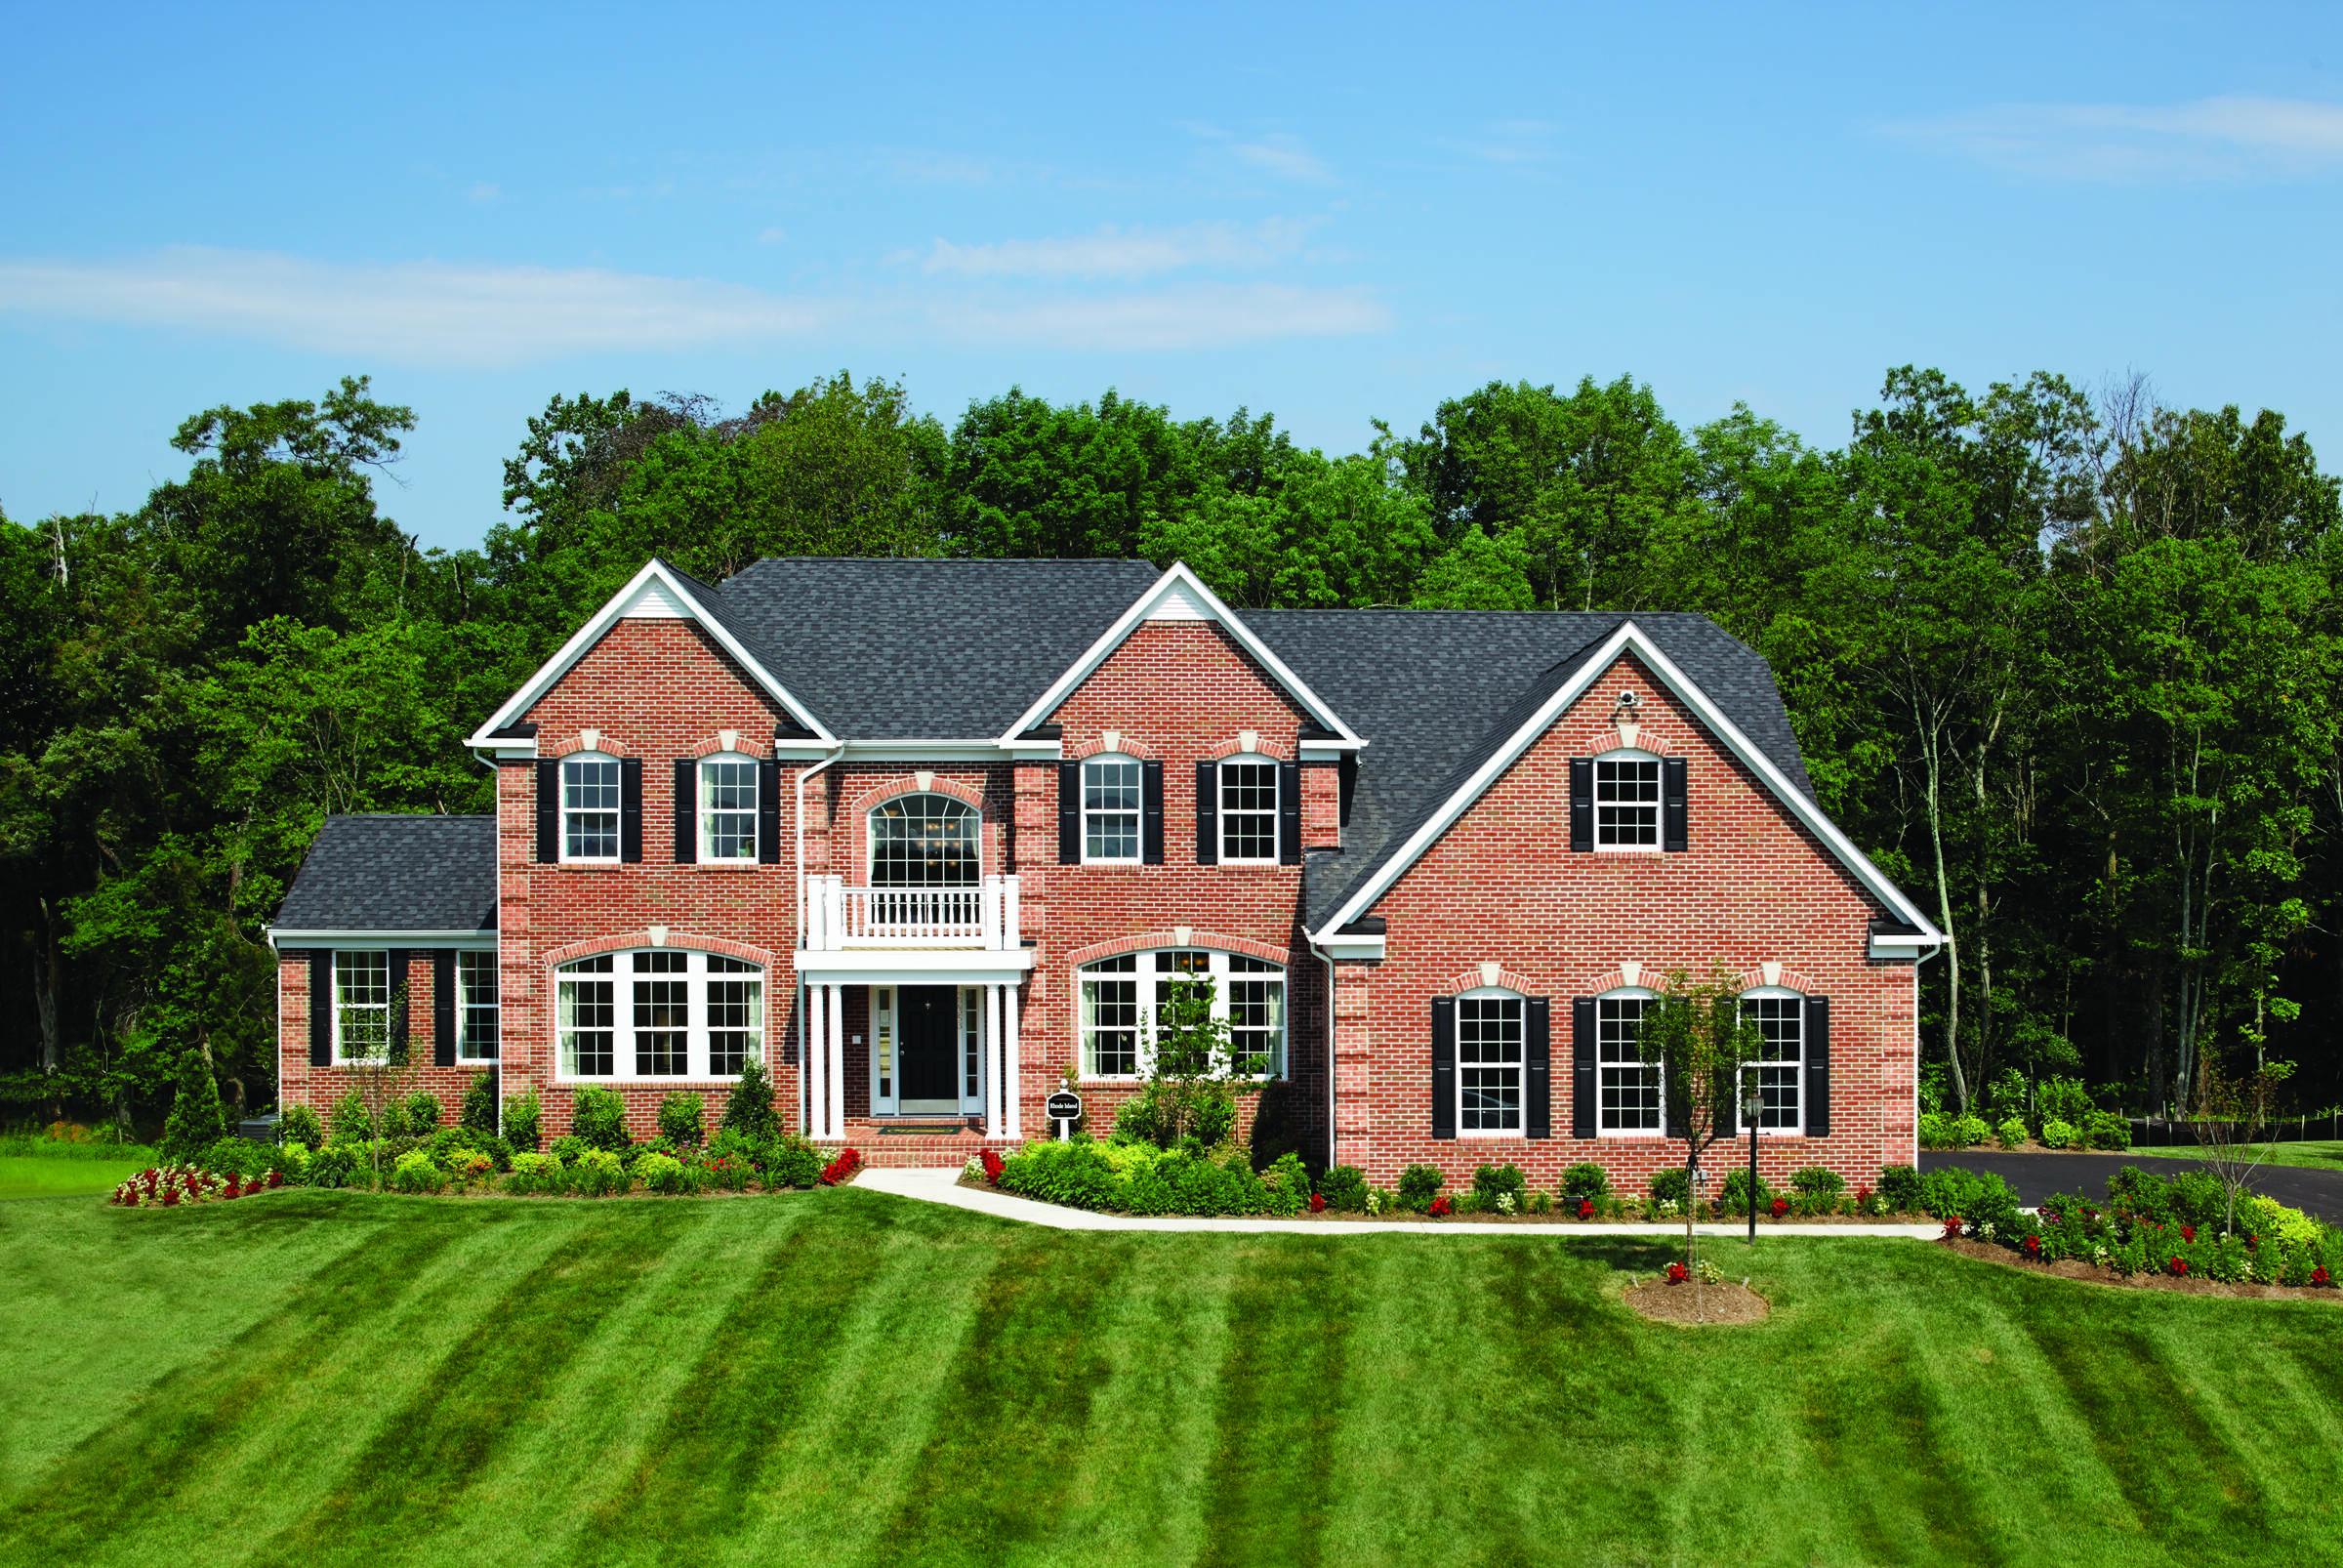 K hovnanian home design gallery house design plans for K hovnanian home designs